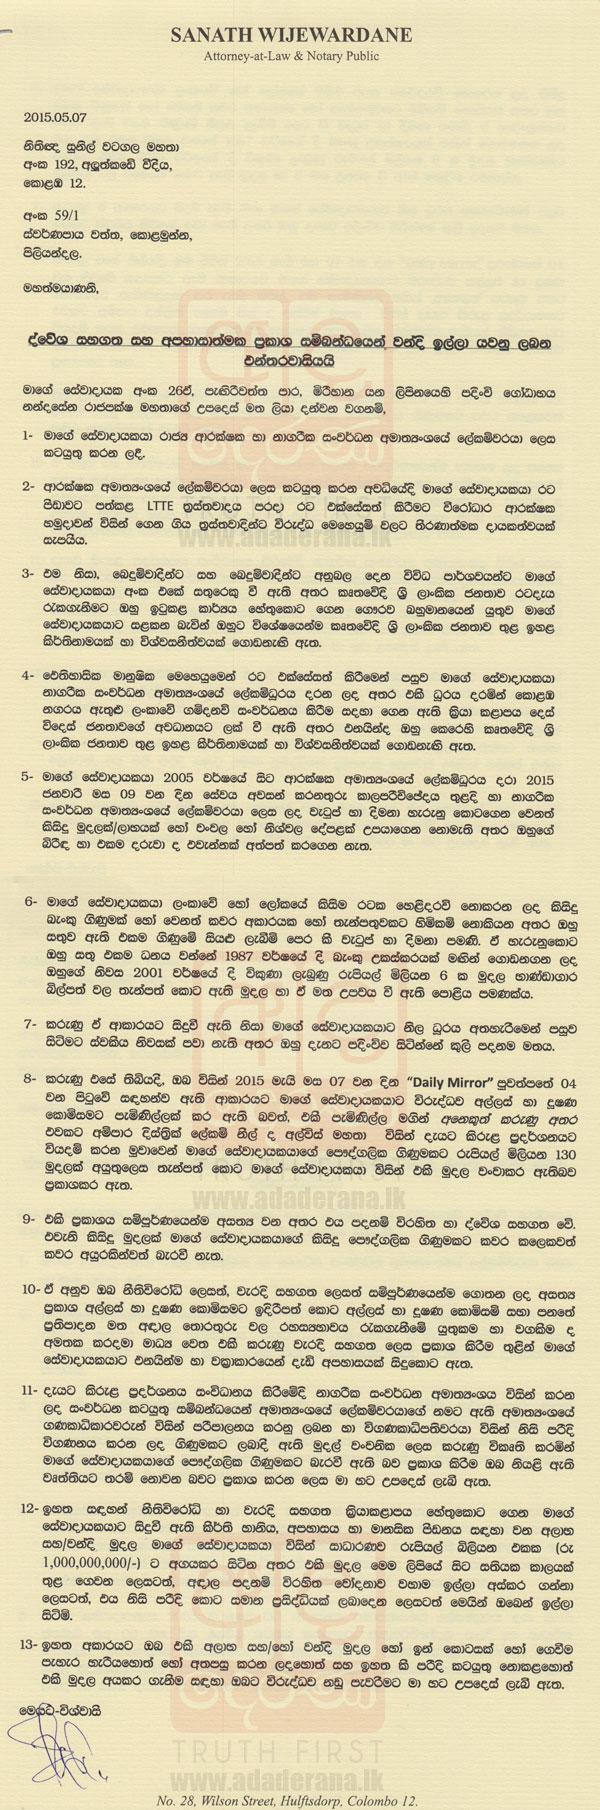 Gotabaya seeks Rs 1 billion in damages from Watagala